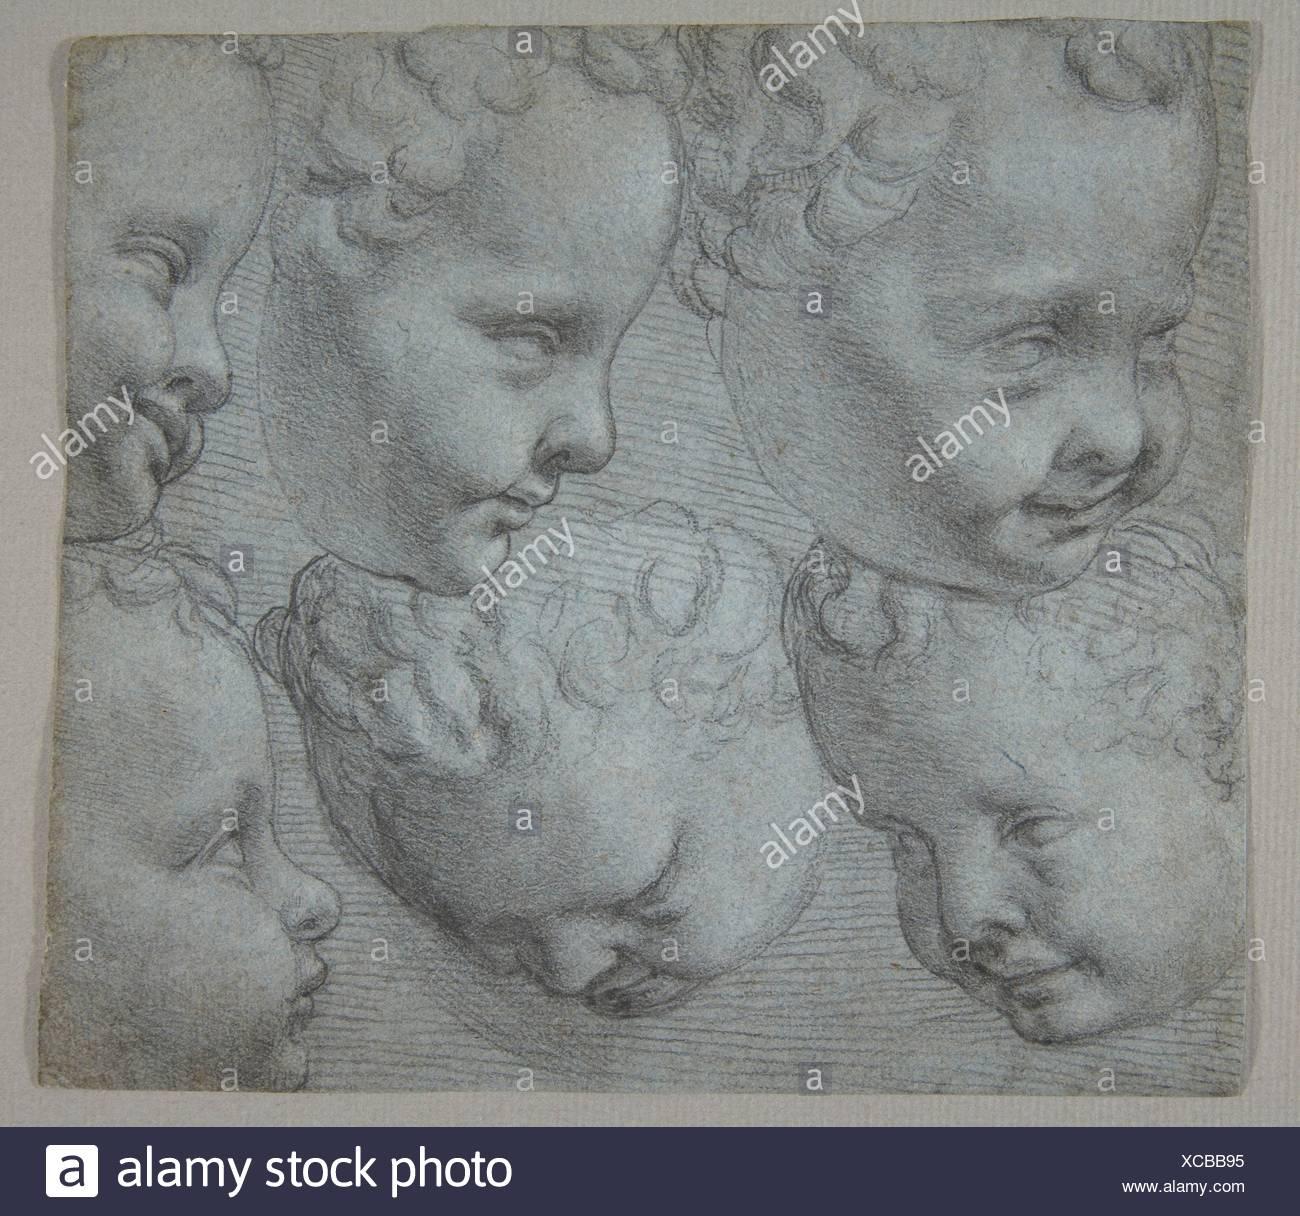 Studies of the Head of an Infant (after a three-dimensional model). Artist: Poppi (Francesco Morandini) (Italian, Poppi 1544-1597 Florence); Date: - Stock Image